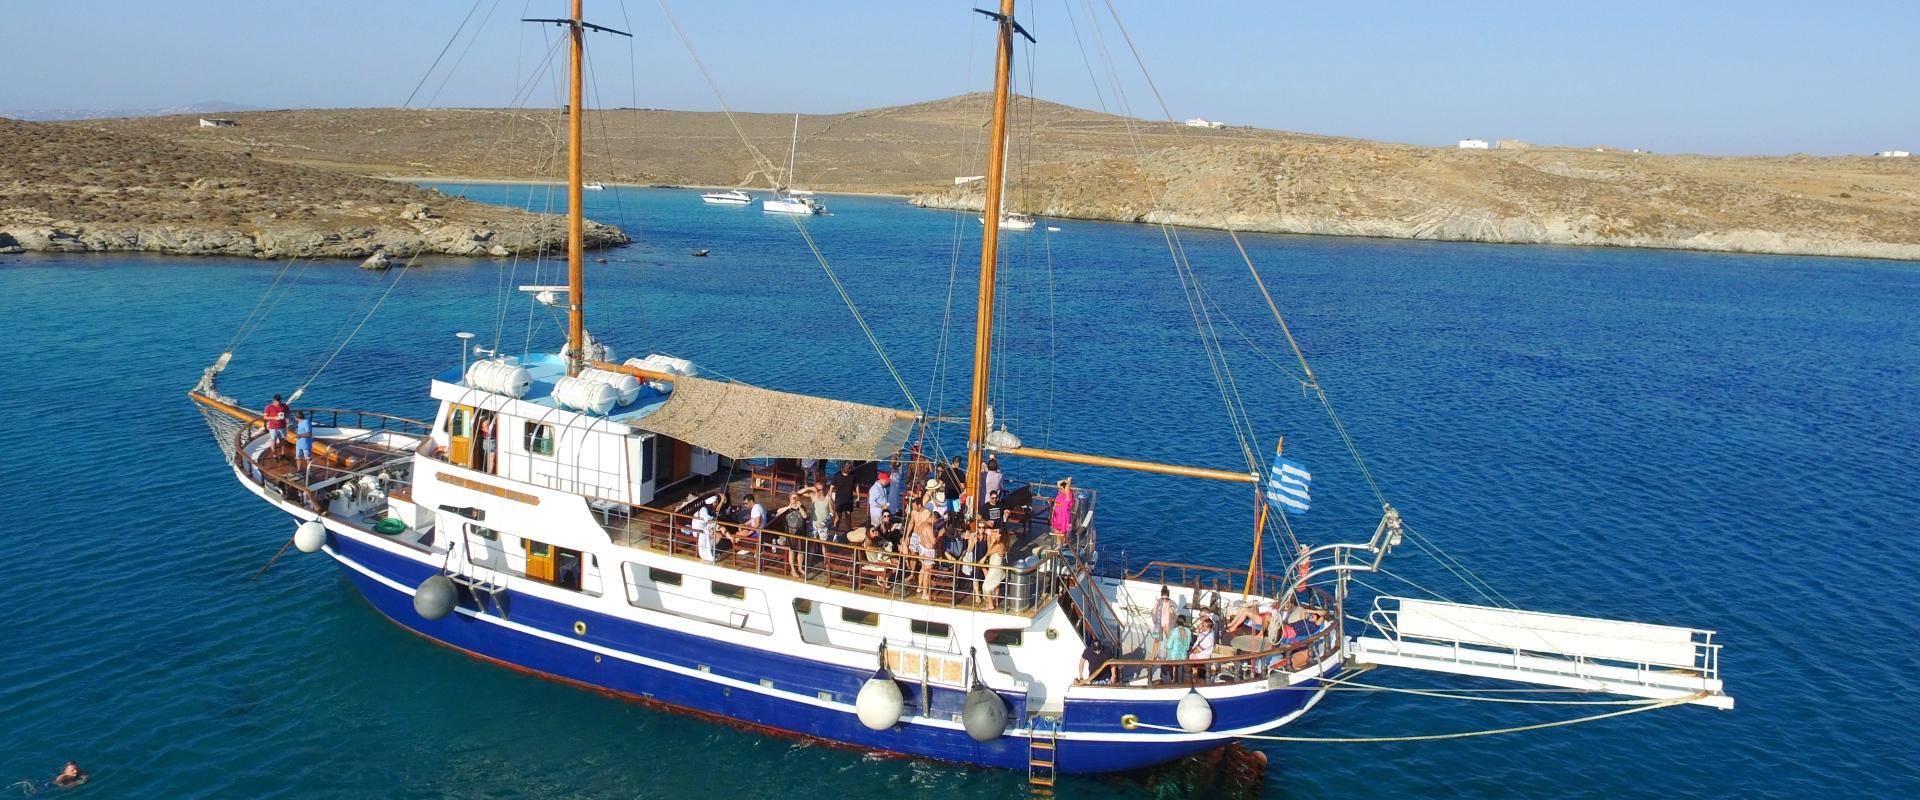 ophia-star-cruise-boat-mykonos-bg-cover-5-Aegean-Ventures